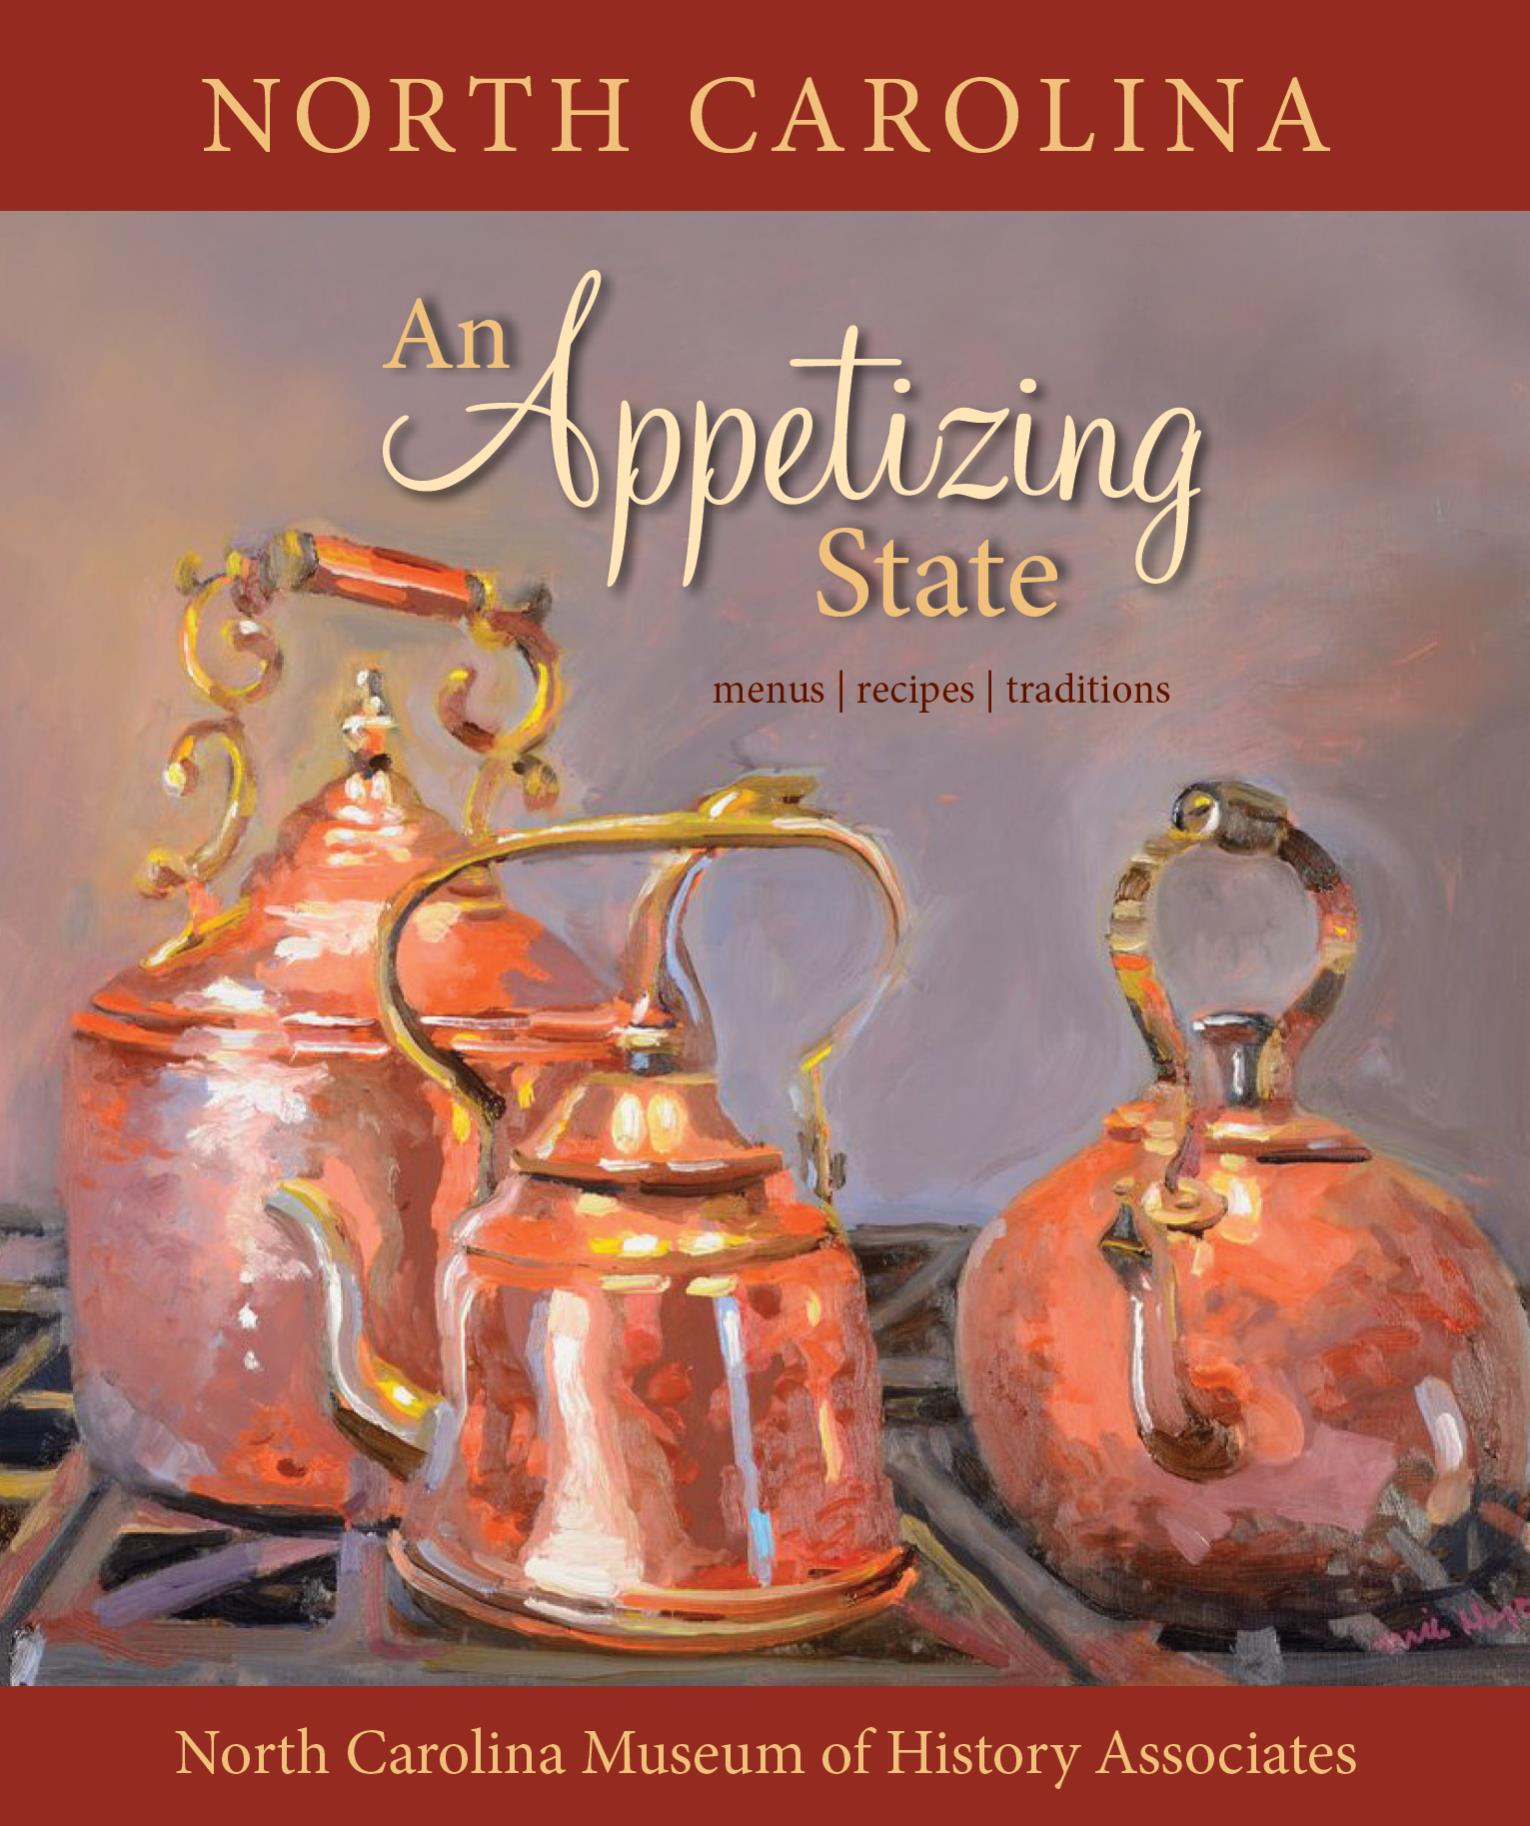 North Carolina: An Appetizing State! Cookbook